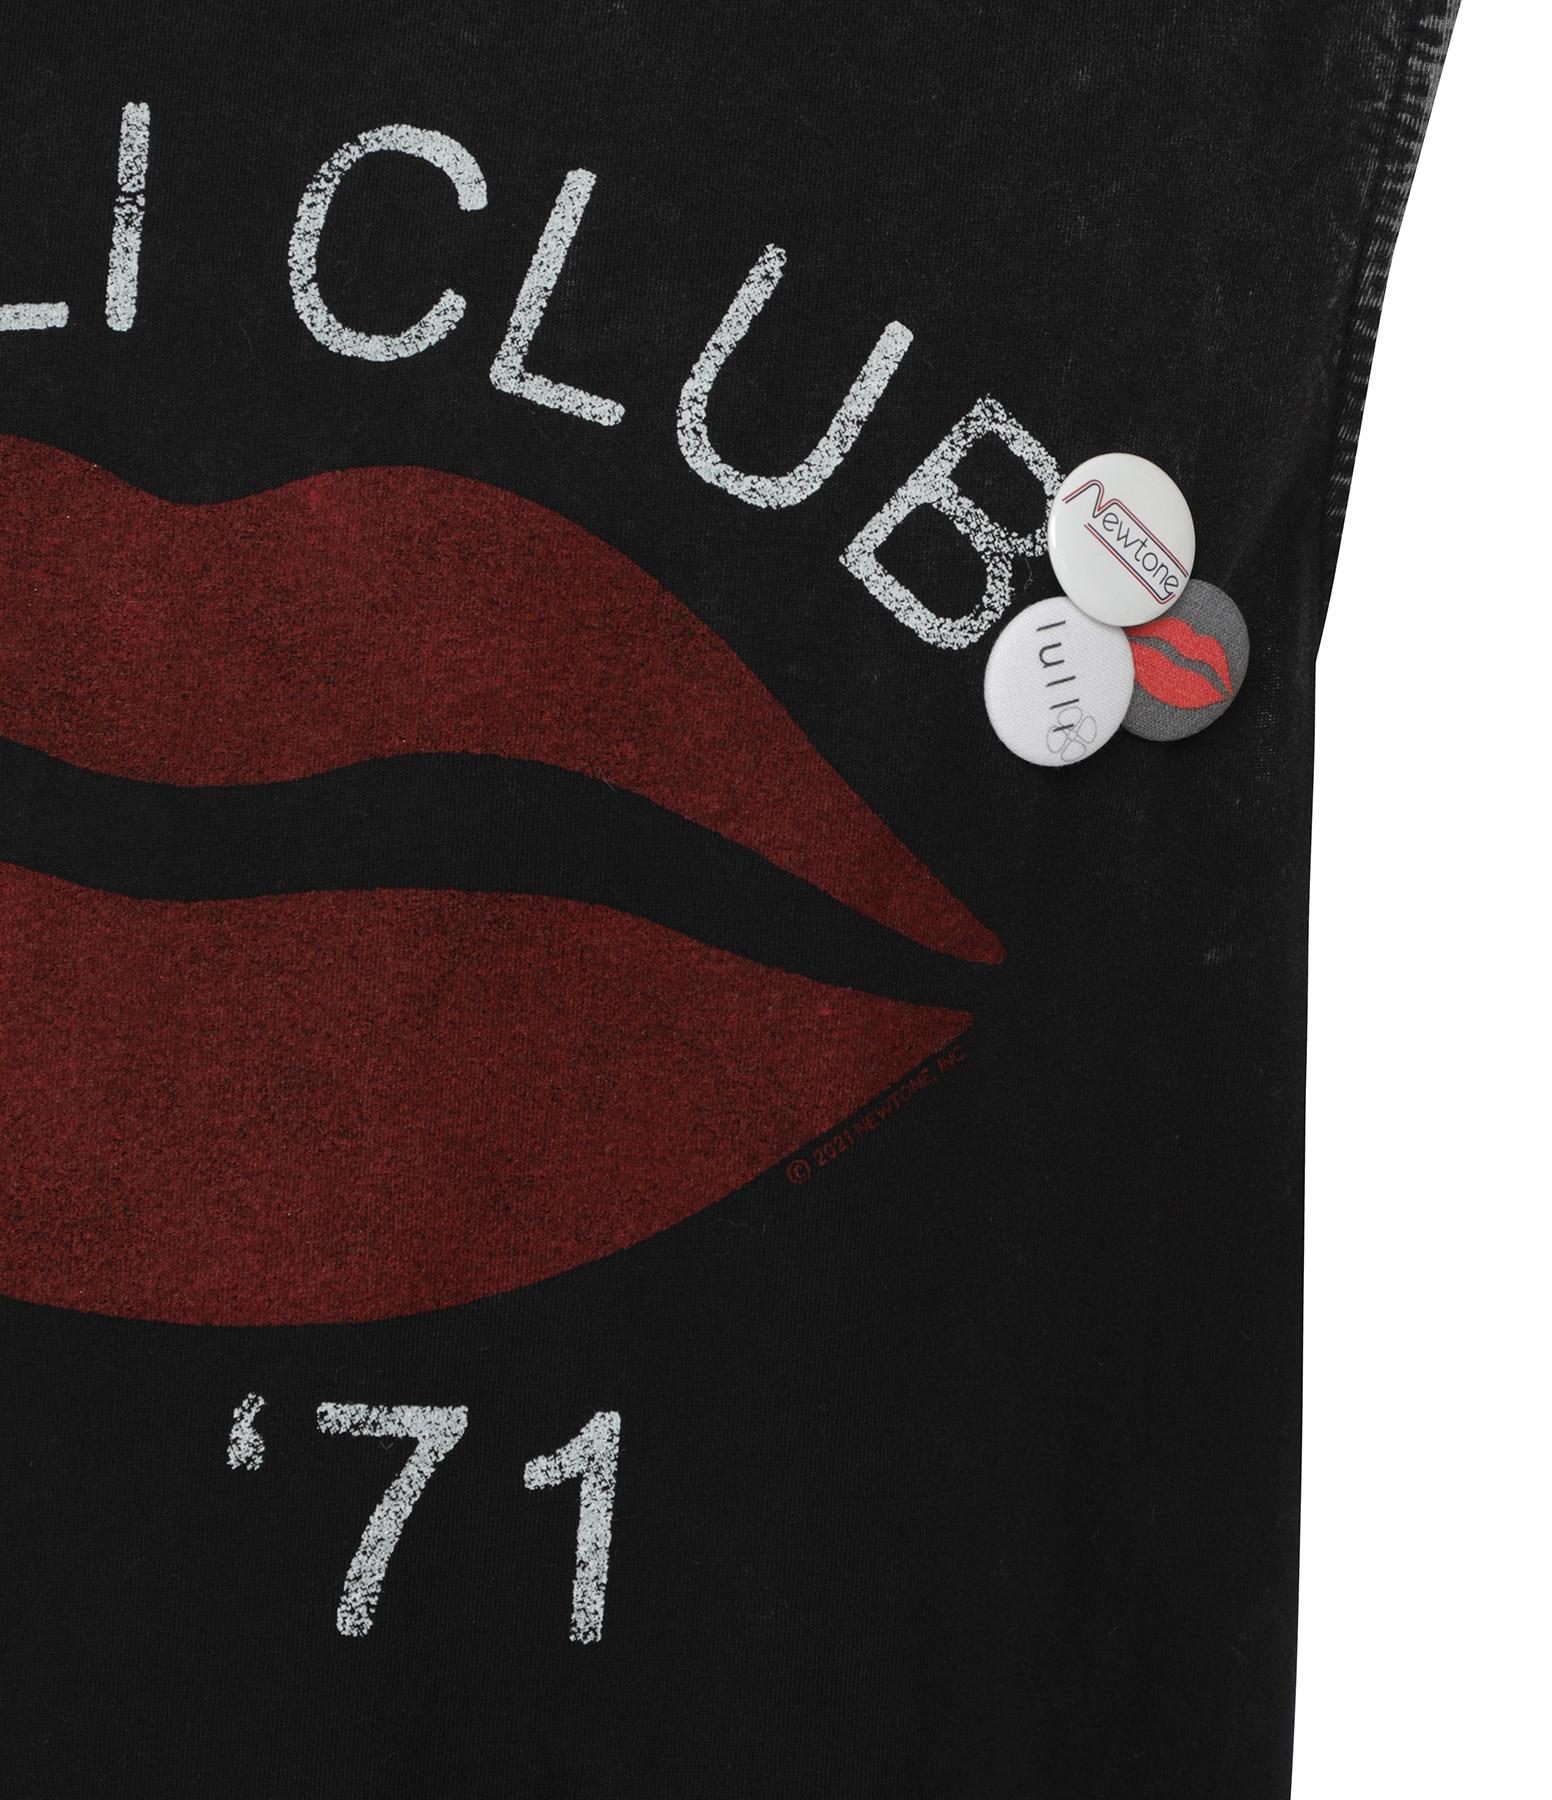 NEWTONE - Robe Daytona Love Club Coton Noir